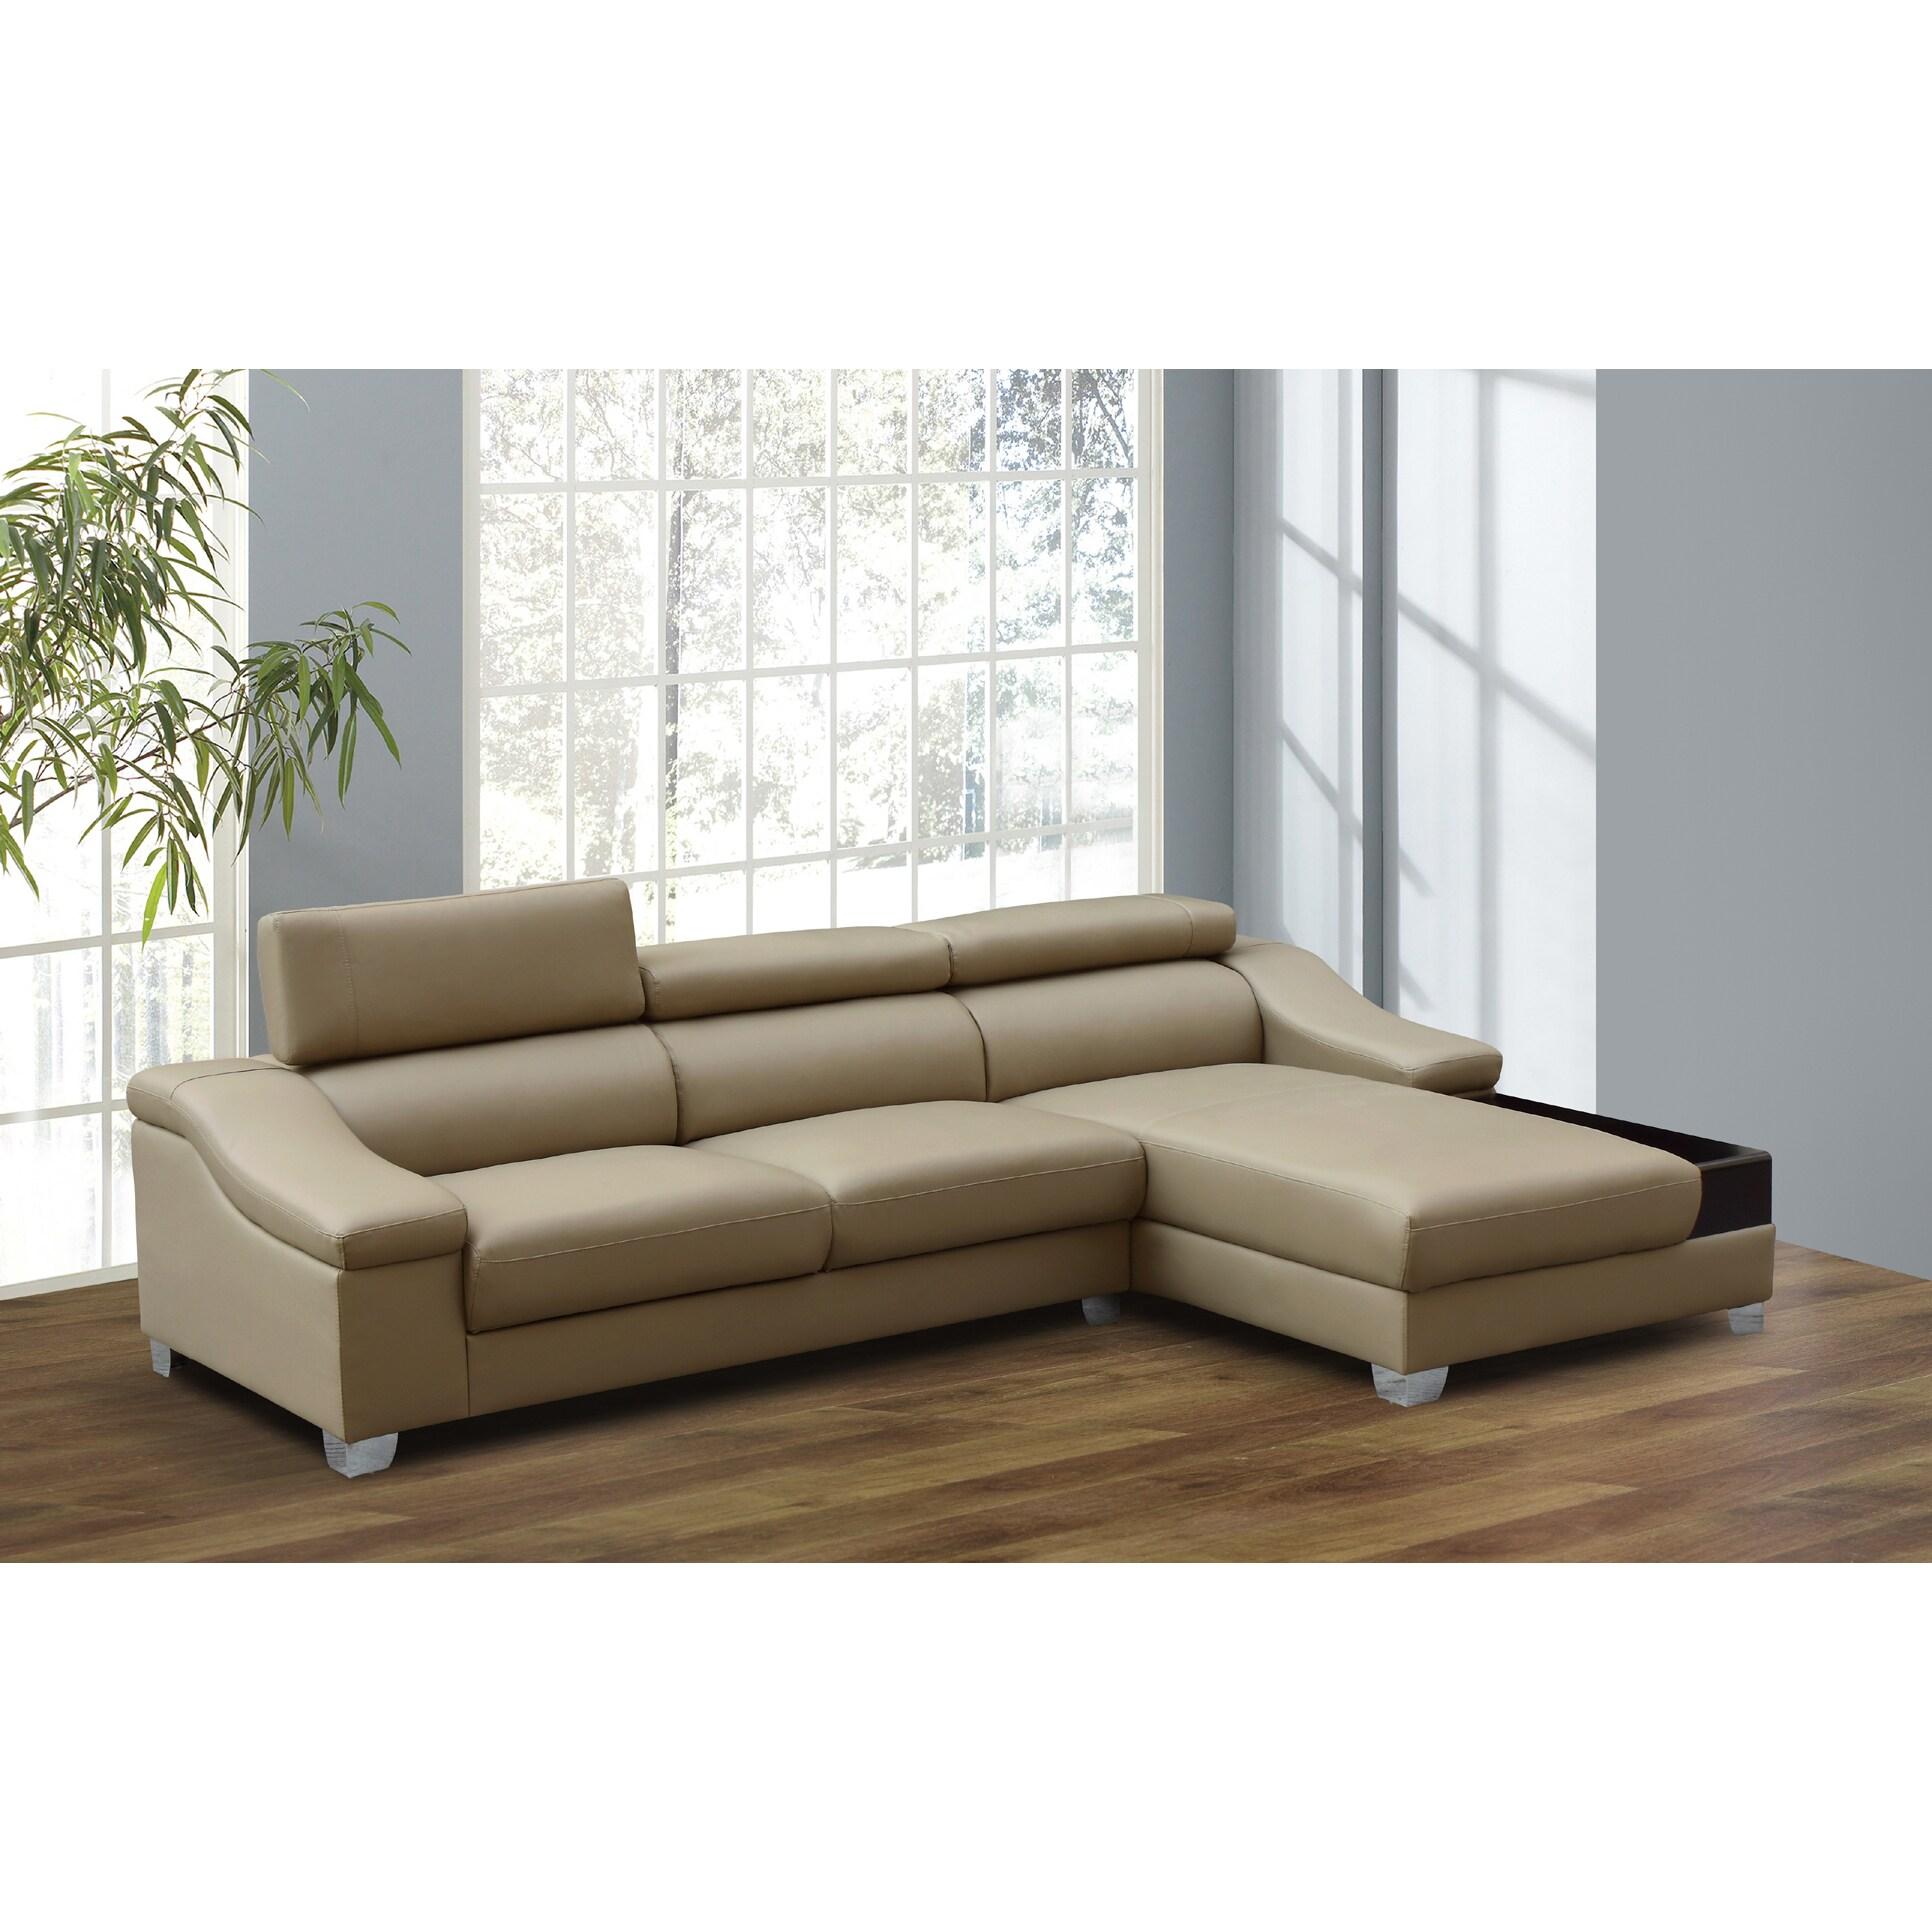 miller 2 piece dark beige modern bonded leather sectional sofa set